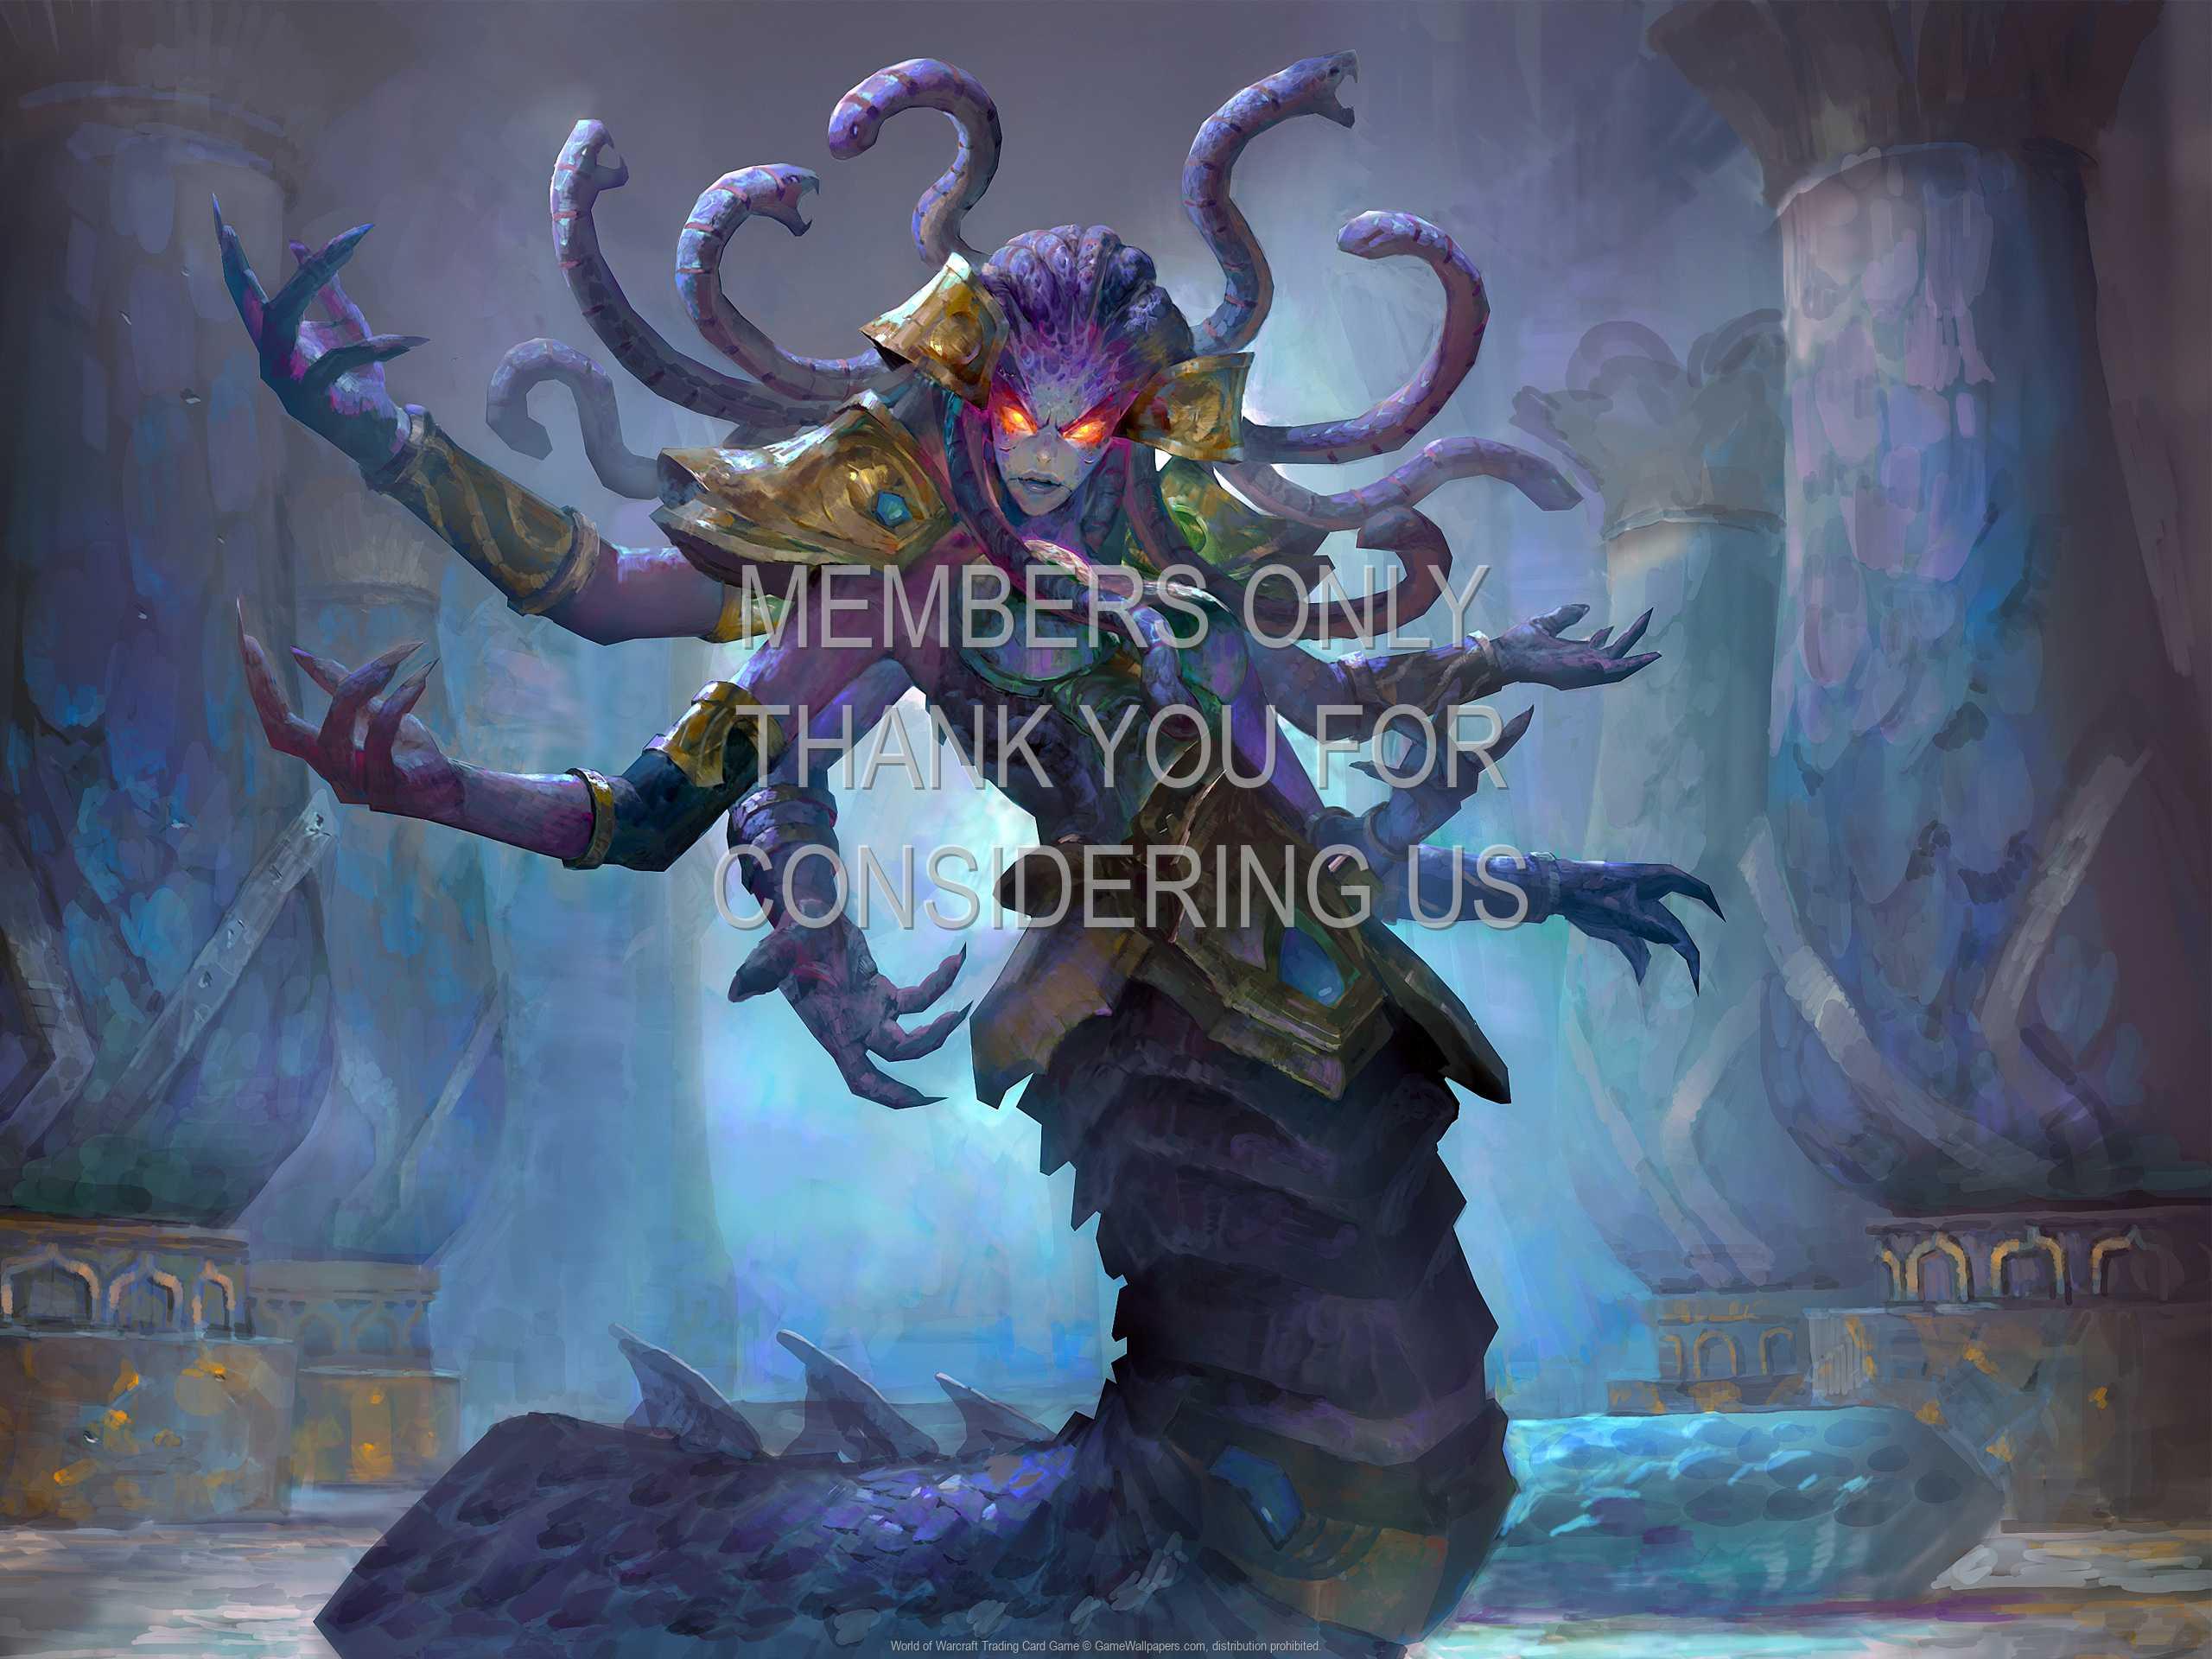 World of Warcraft: Trading Card Game 1080p Horizontal Handy Hintergrundbild 58